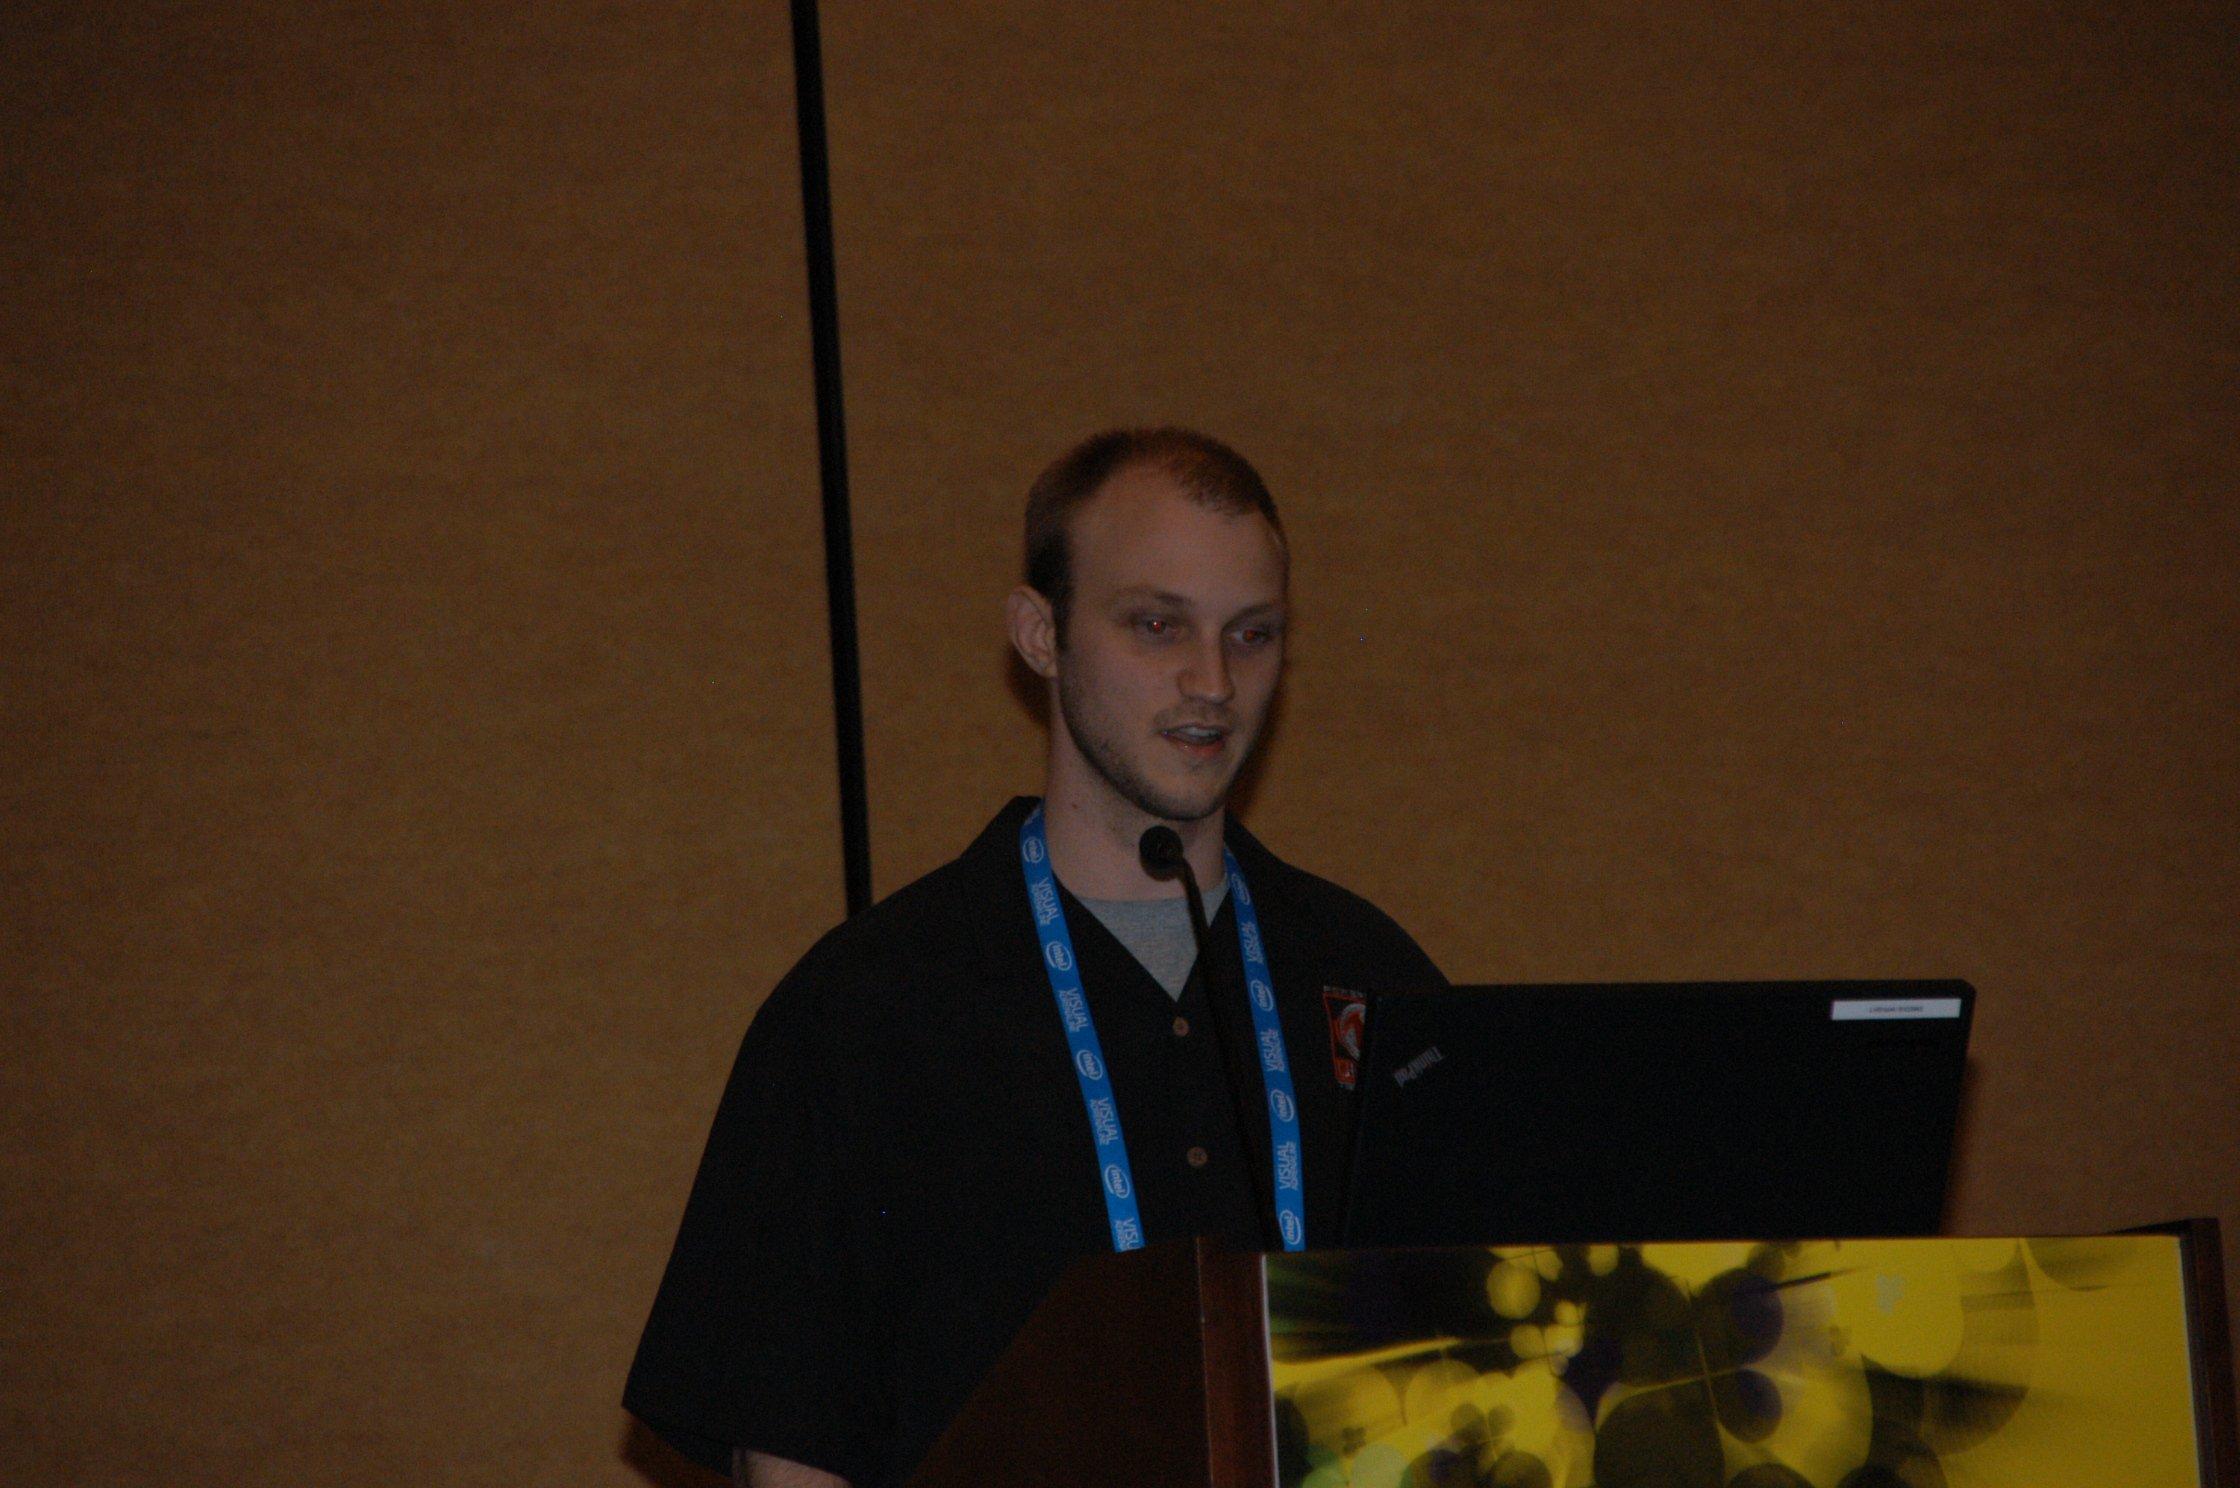 「GoW2」におけるレンダリングテクニックについて語ったDaniel Wright氏(Epic Games,Engine Programmer)